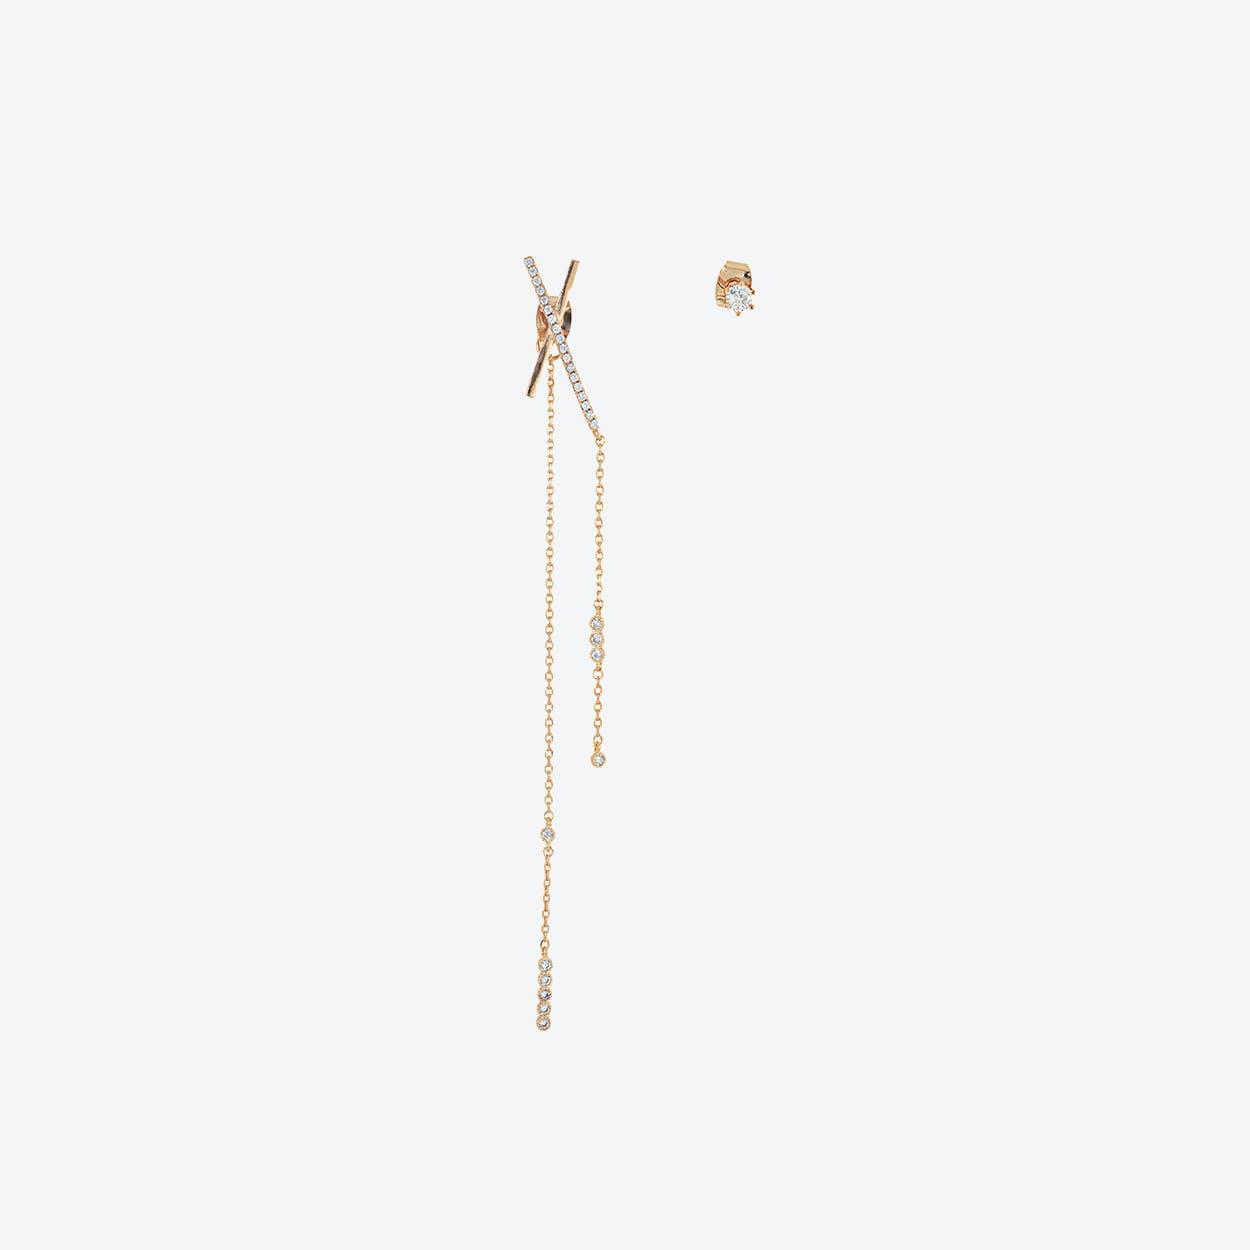 Rose Gold Asymmetric Statement Bar Earrings